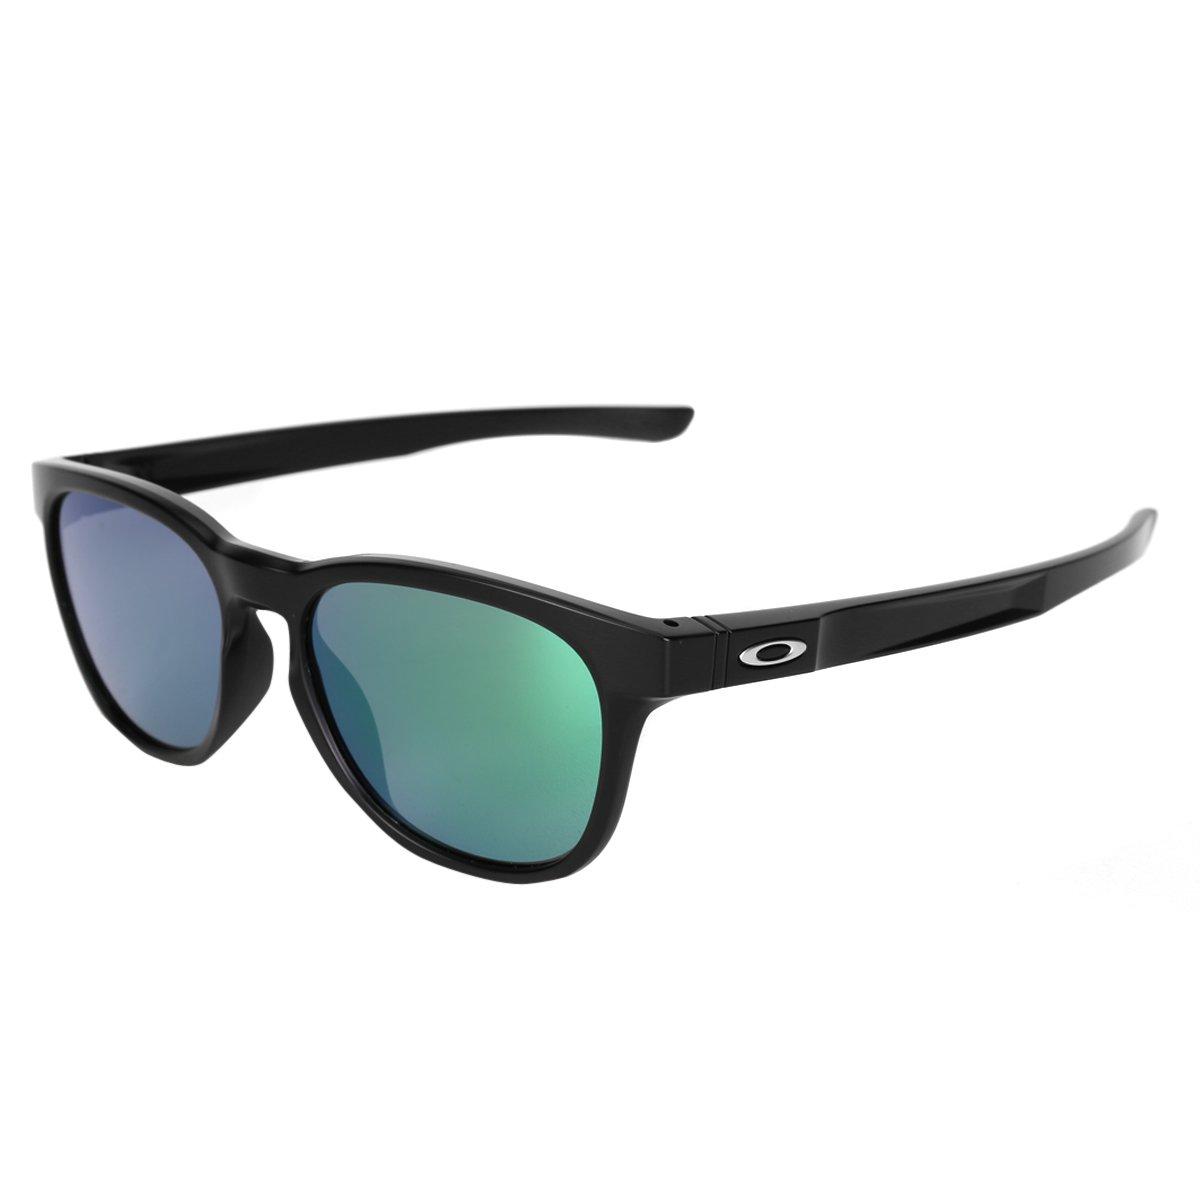 d3409a42c0f5c Óculos Oakley Stringer-Iridium - Compre Agora   Zattini